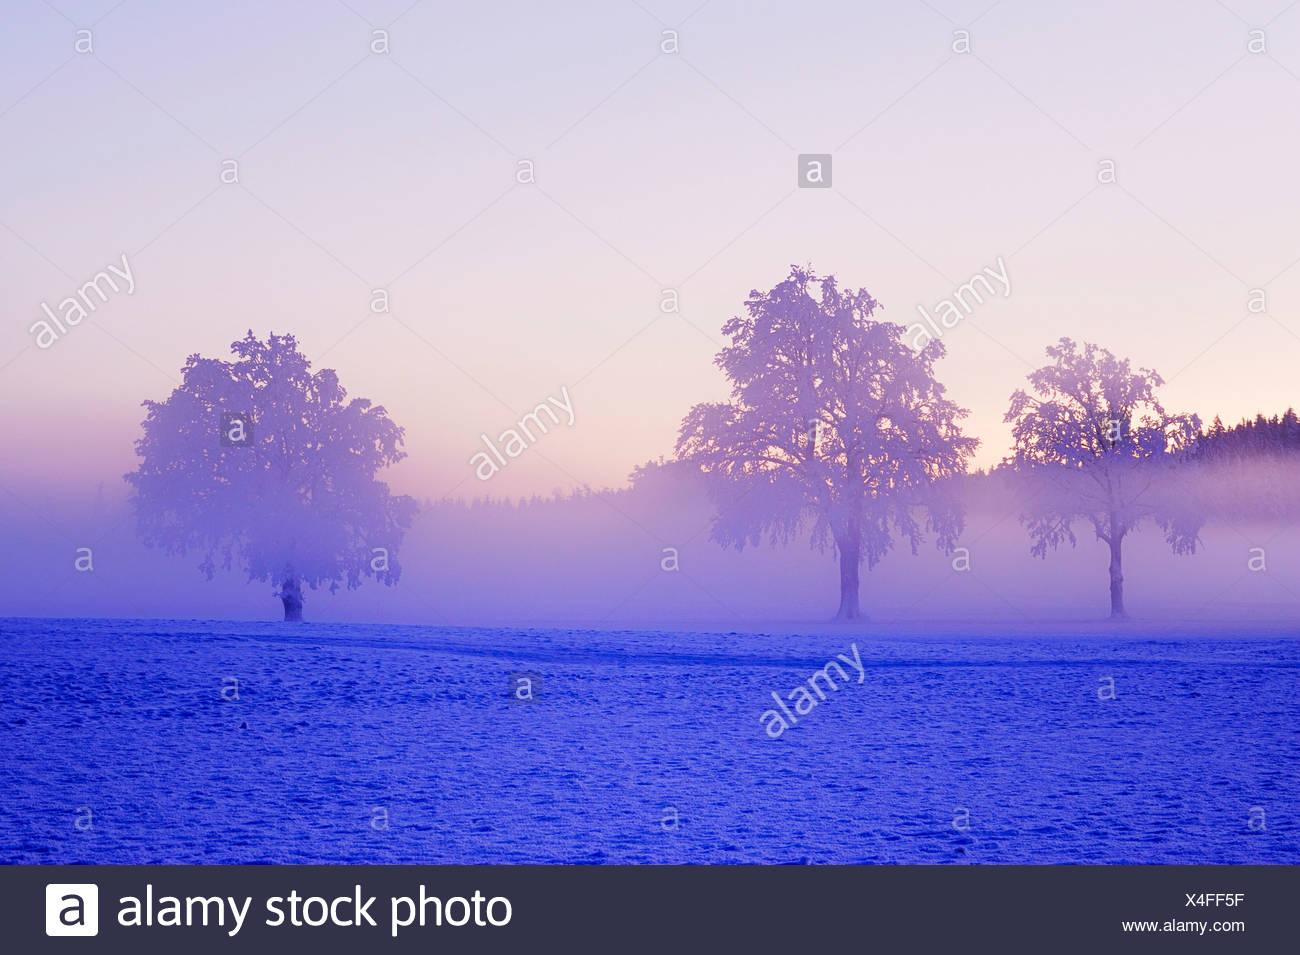 Winterlandschaft, eingehüllt in Nebel, Horben, Aargau, Schweiz, Europa Stockbild